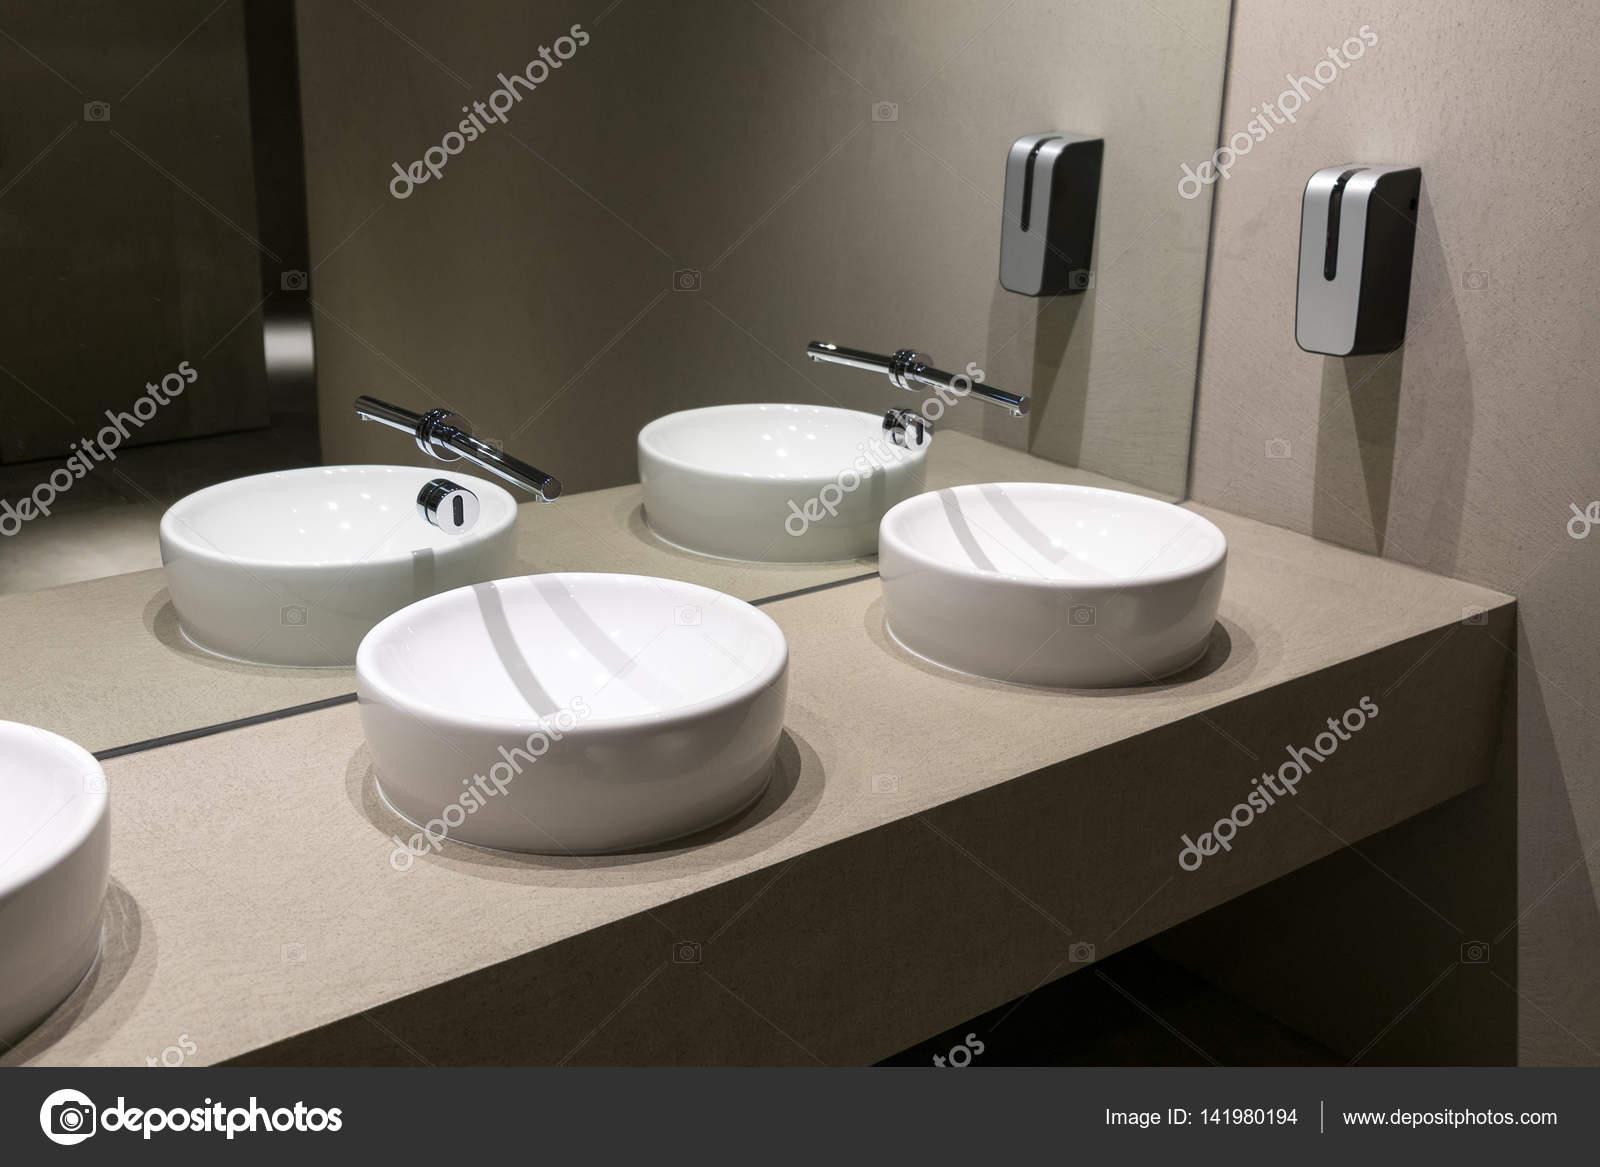 Contemporary European Ceramic Sink Modern Washbasin In Office Building Washstands With Photocells Public Toilet Wash Basins Beige Bathroom